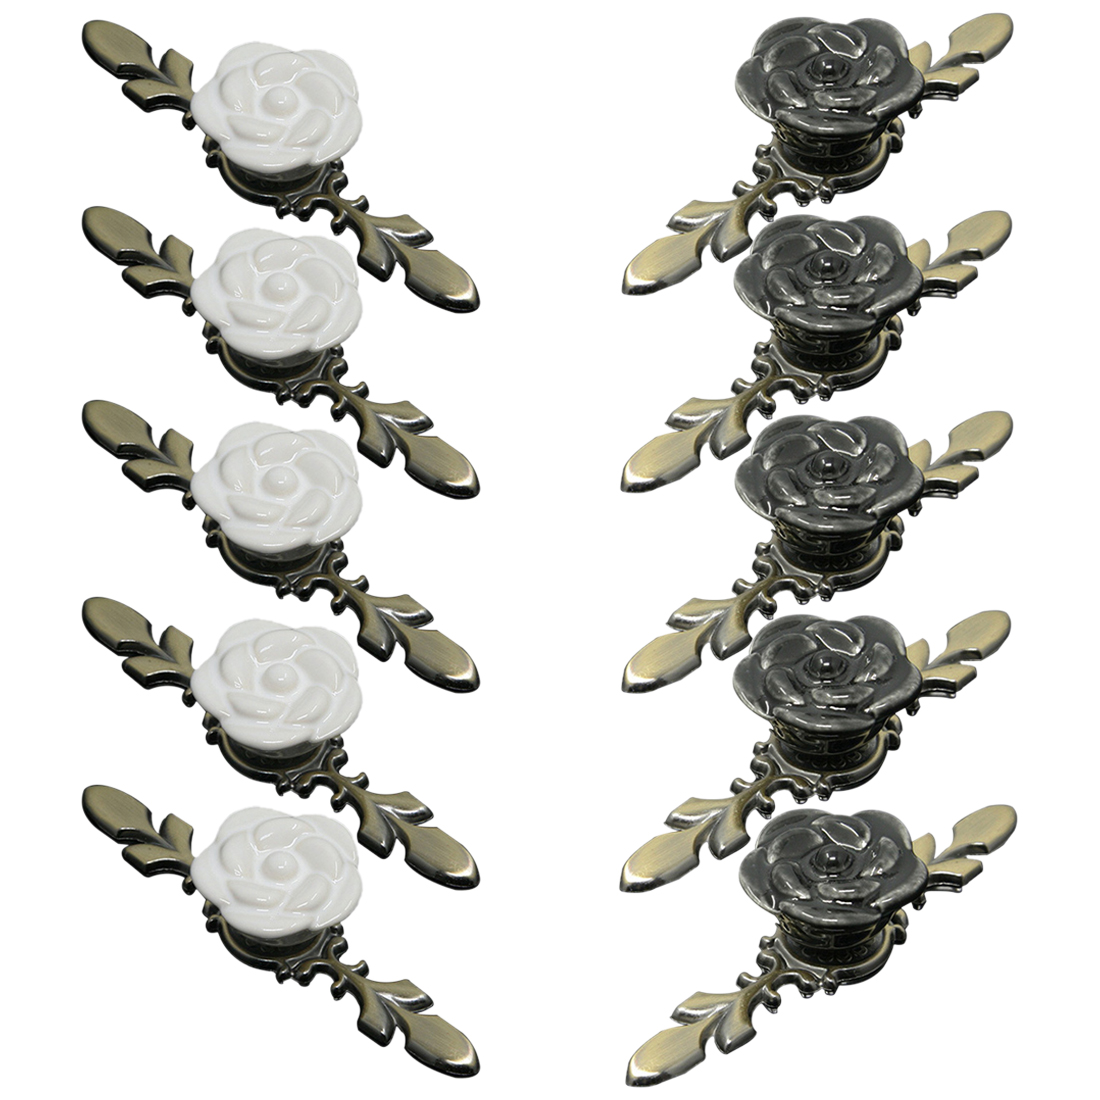 10 pcs Set Rose Shape Ceramic Furniture Handles Creative Doorknob for Cabinet Drawer Wardrobe Door